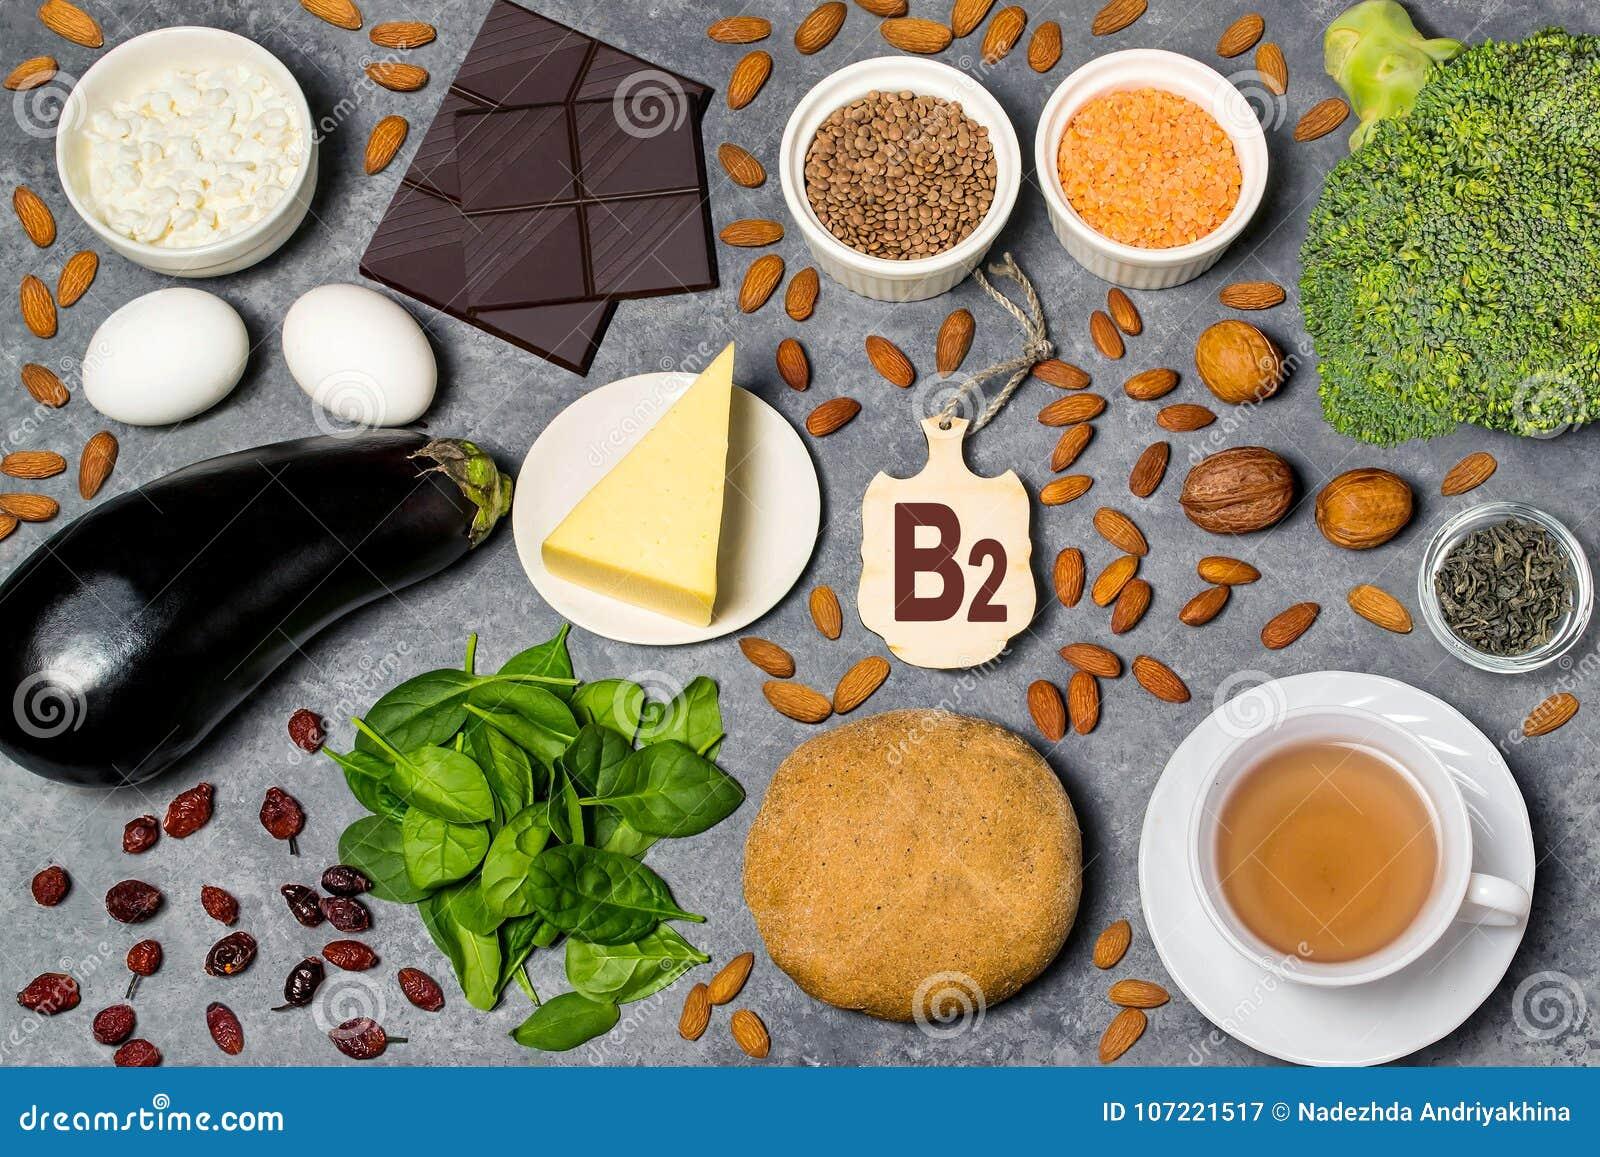 Food is source of vitamin B2